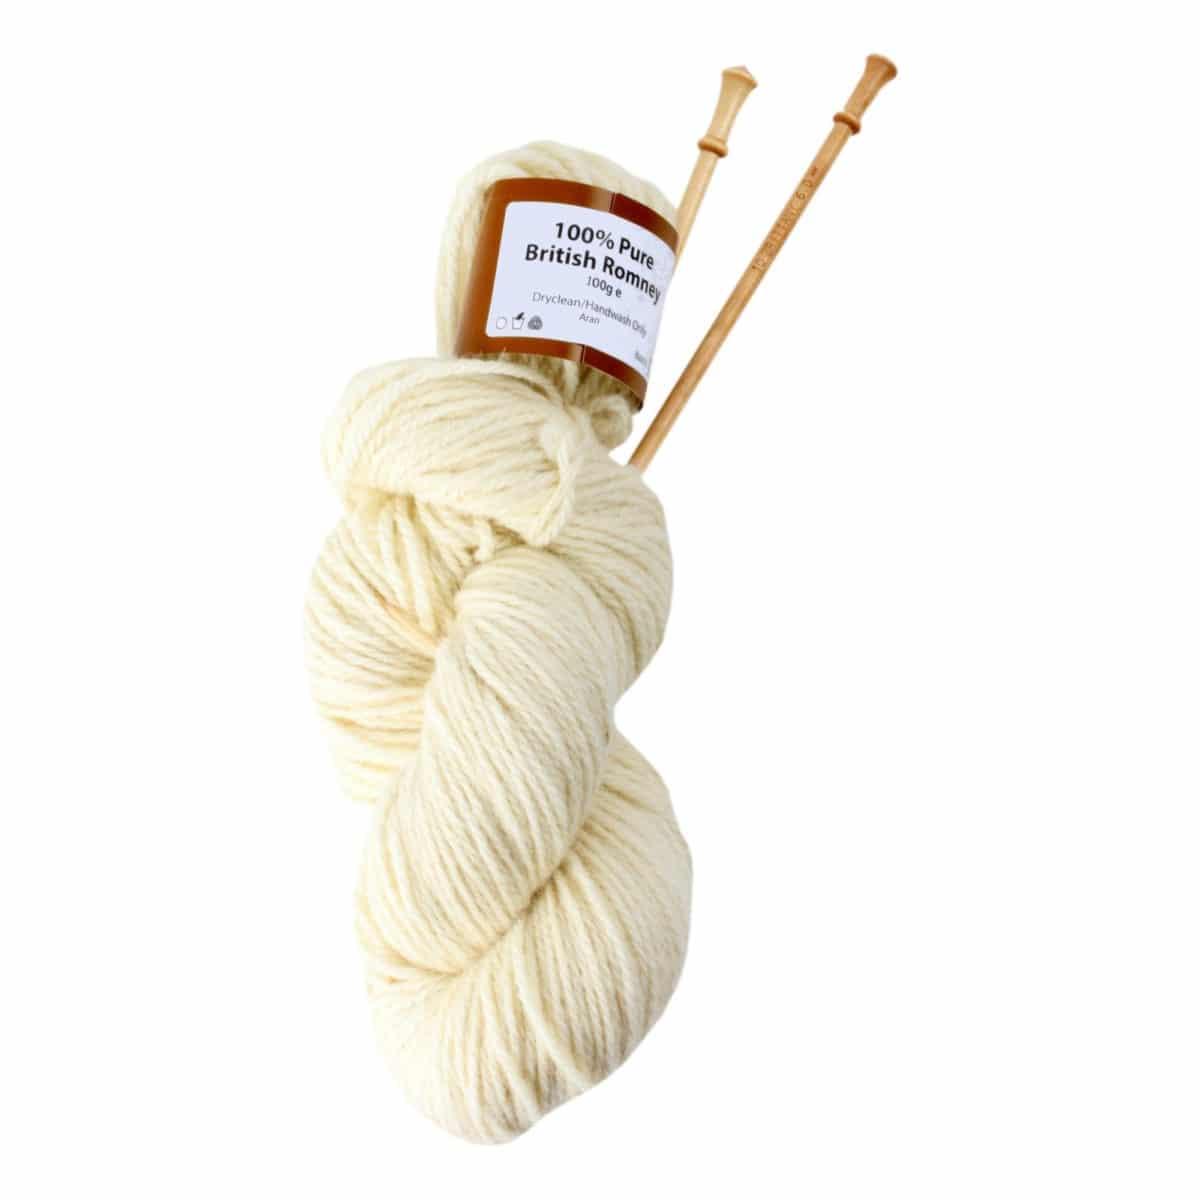 Romney Arun Knitting Wool Ball 100g